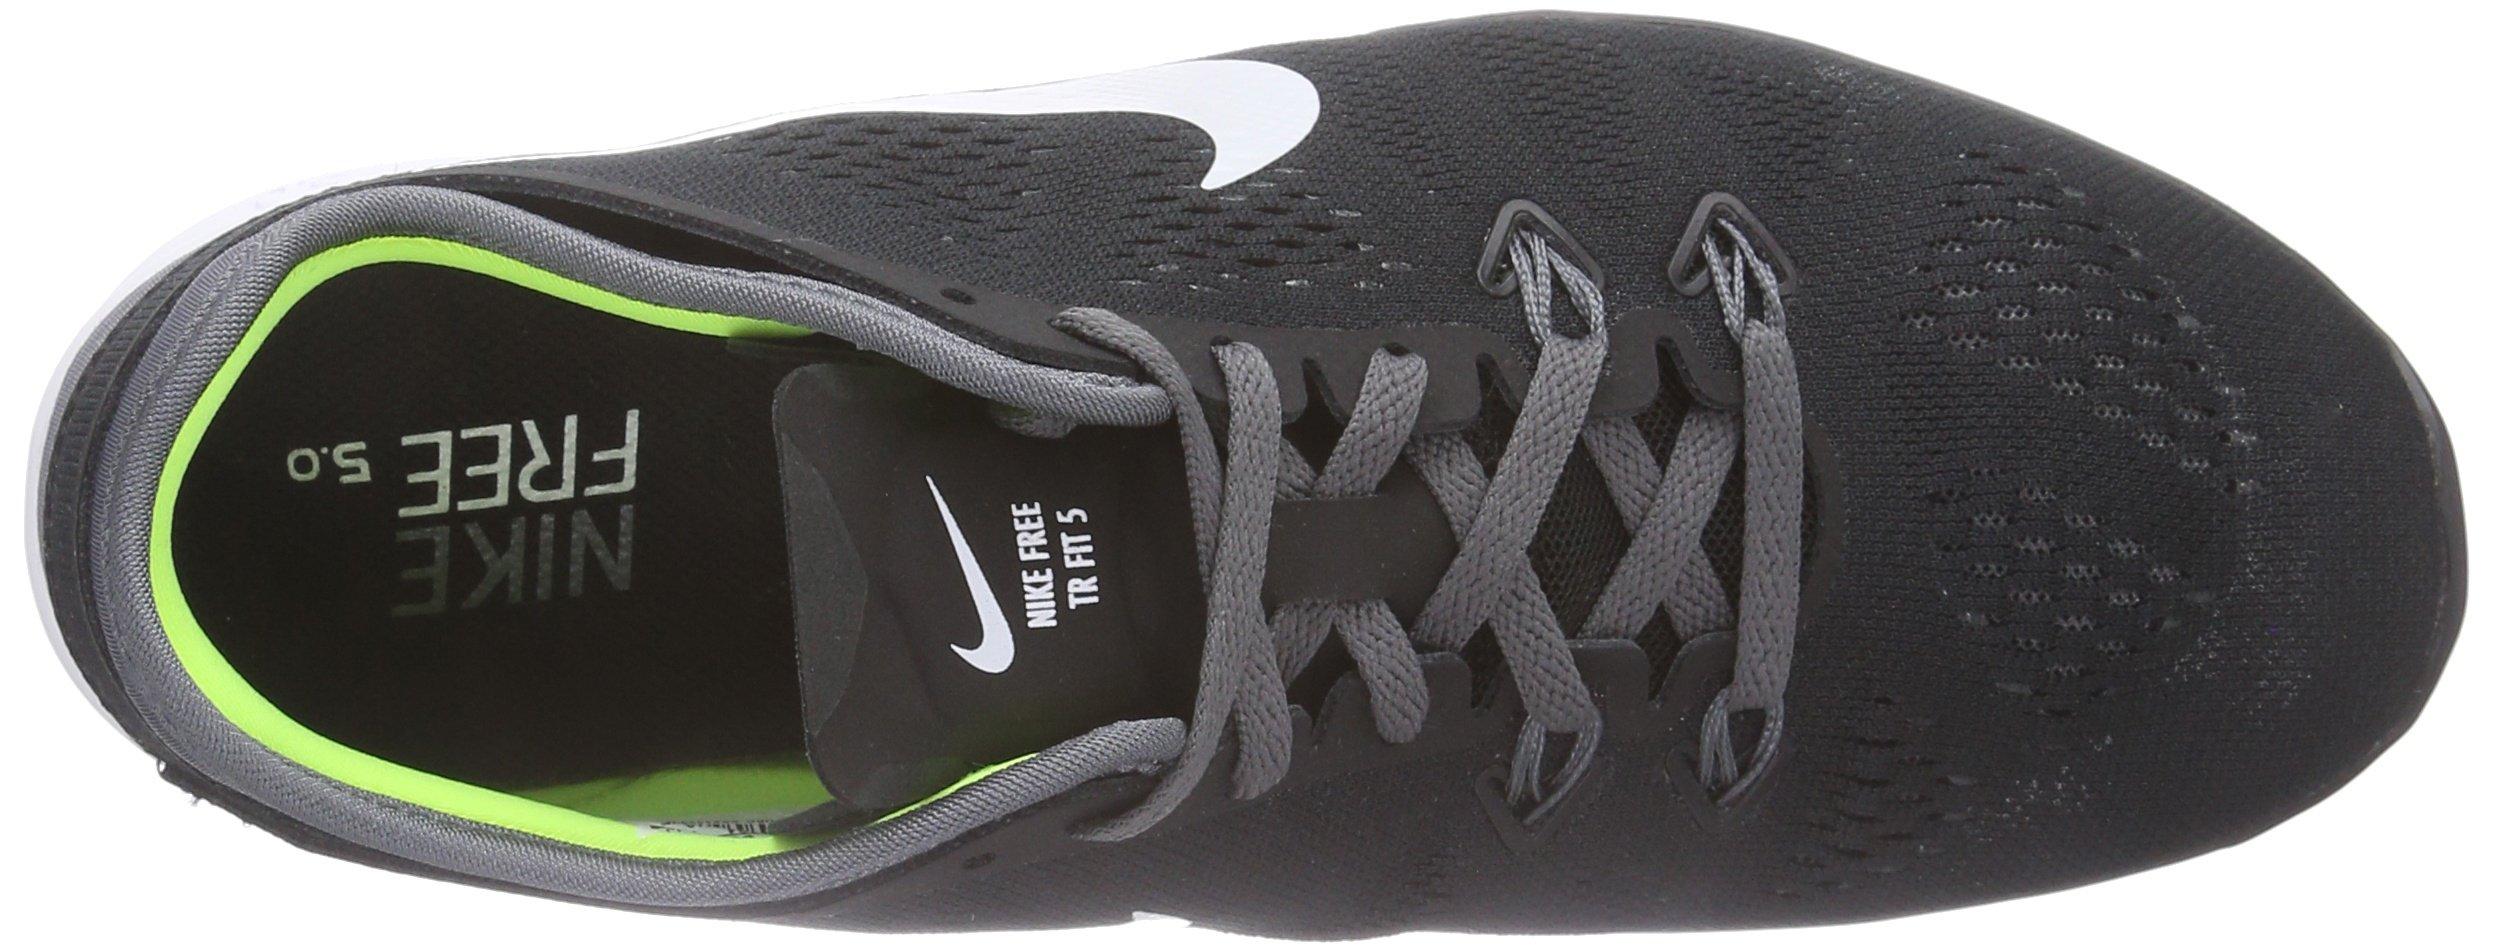 Nike Womens Free 5.0 Tr Fit 5 Black/White/Dark Grey/White Training Shoe 5 Women US by Nike (Image #7)